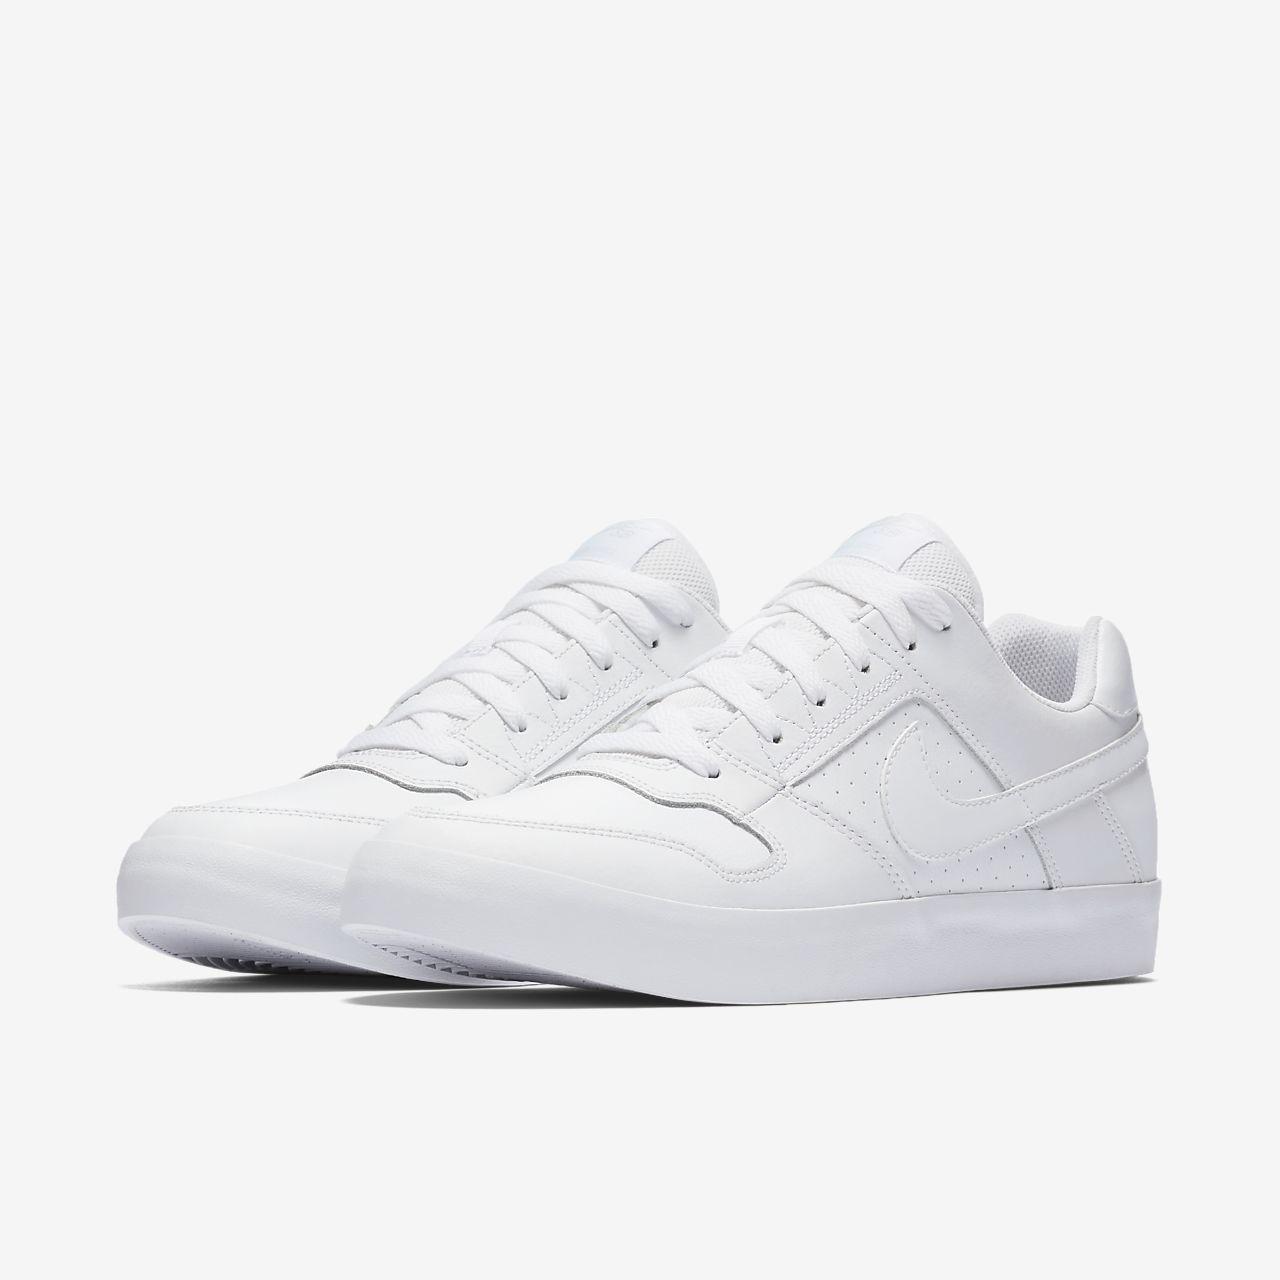 Scarpe NUOVO Nike SB Koston hypervulc uomo Premium da Ginnastica sale